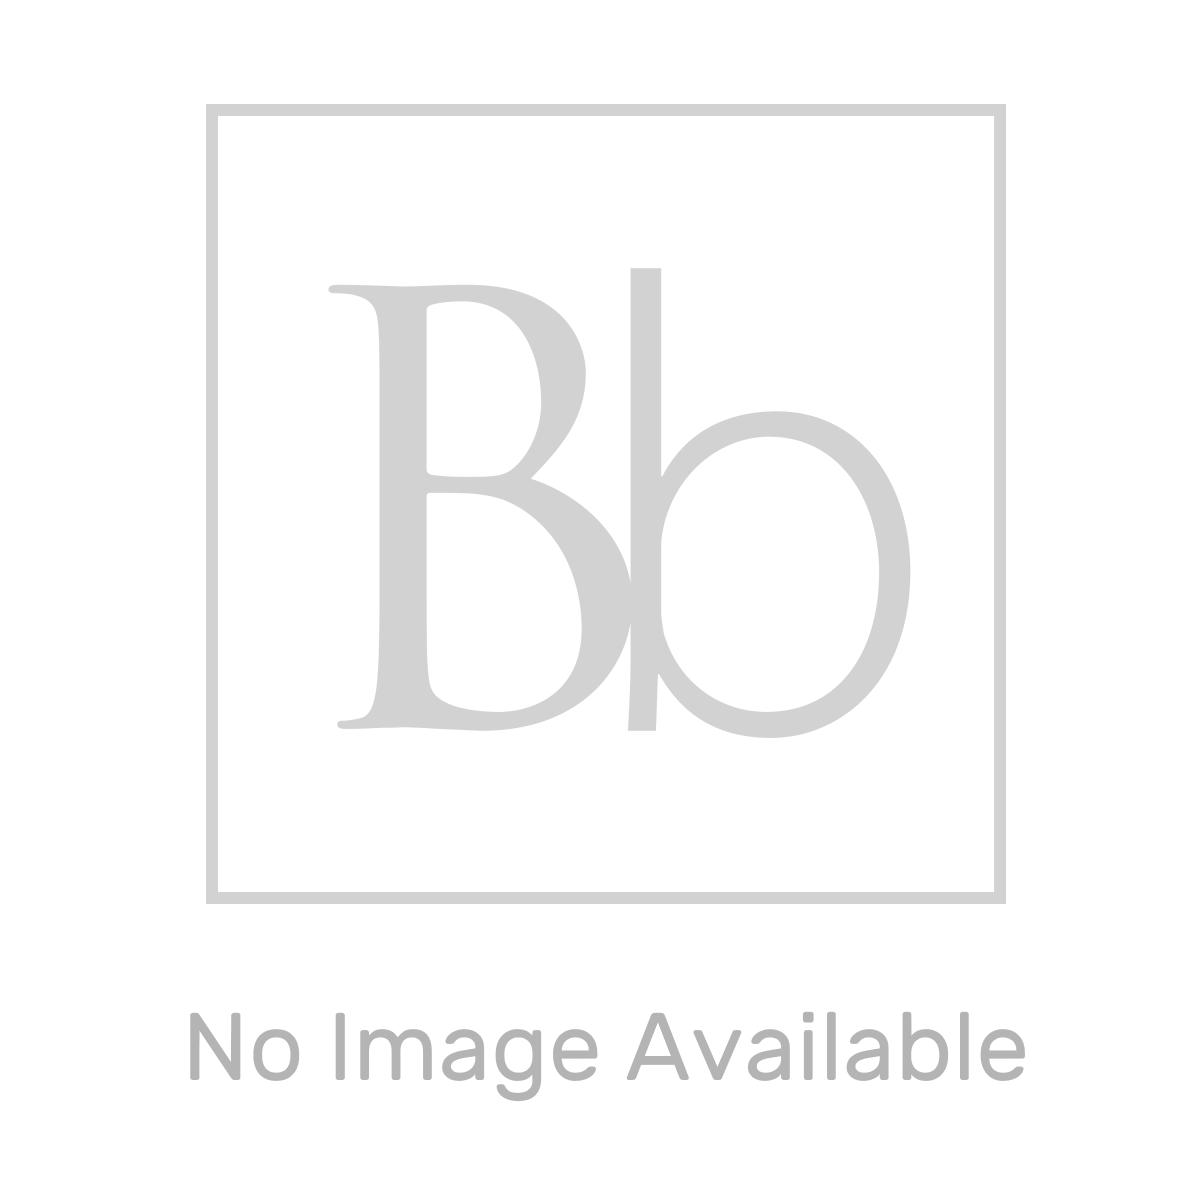 RAK Sensation Gloss White 1 Tap Hole Wall Hung Basin 600mm Measurements